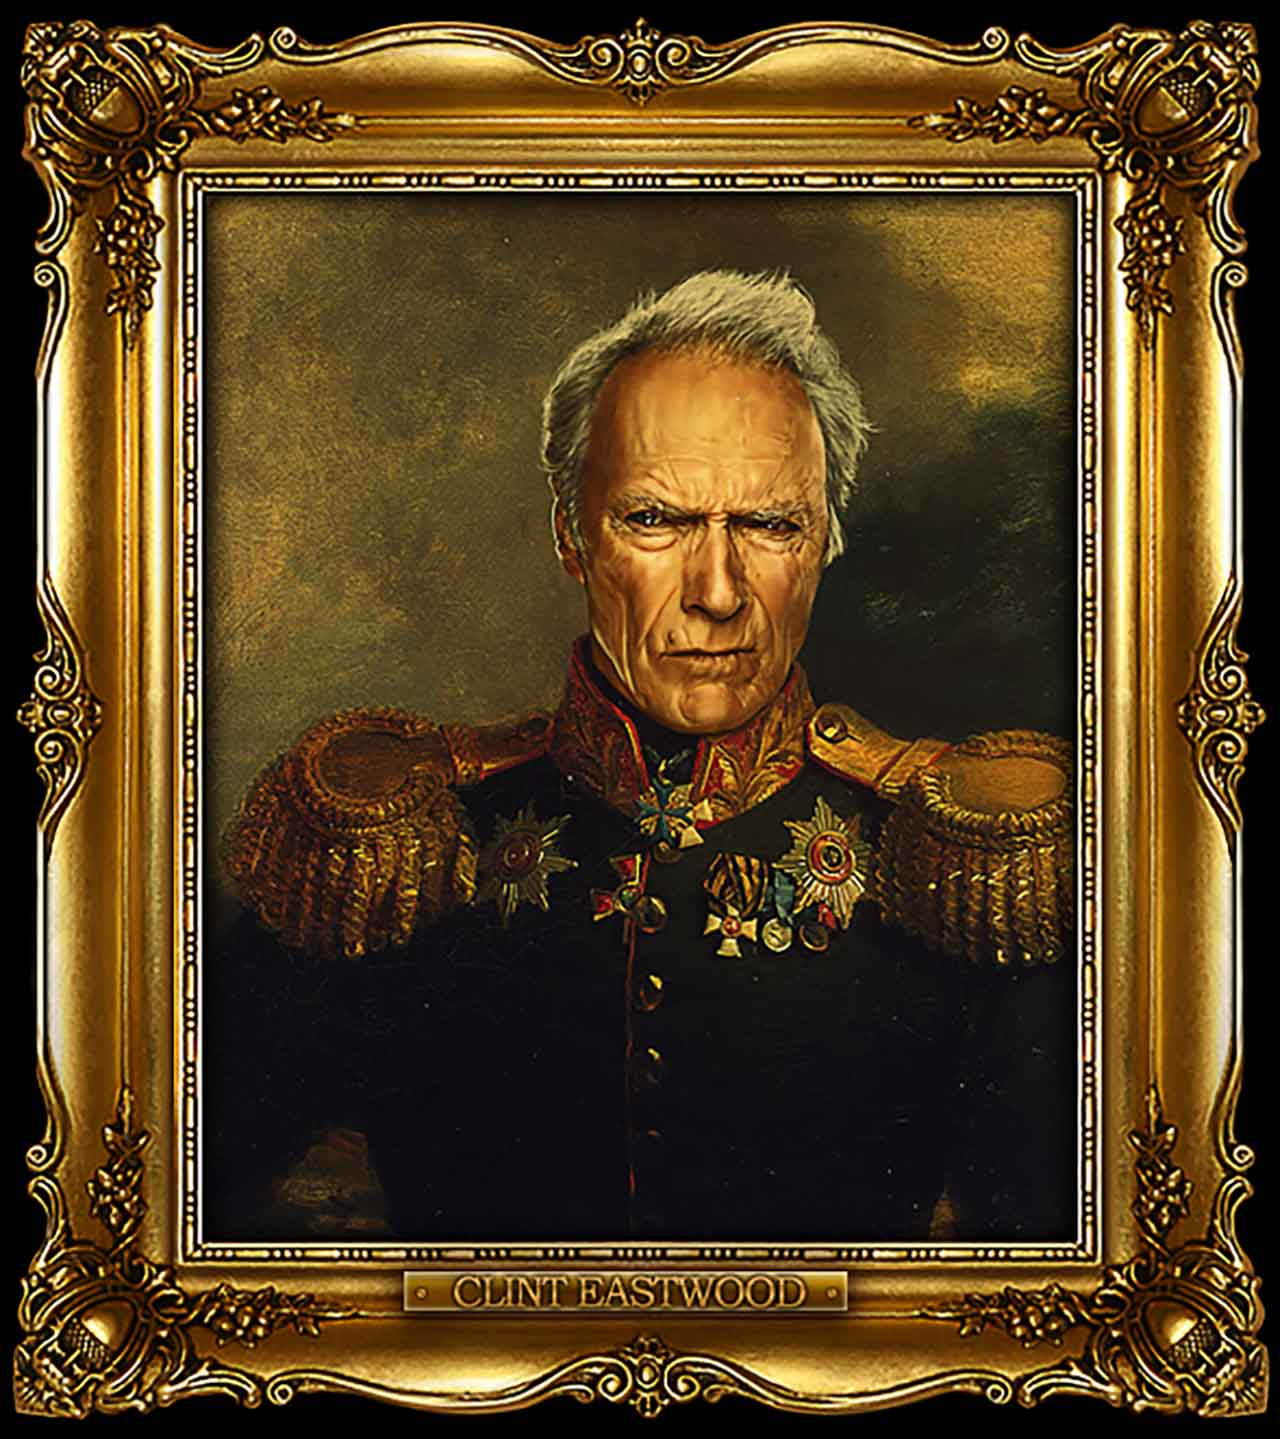 Artist Turns Famous Actors Into Russian Generals - Clint Eastwood